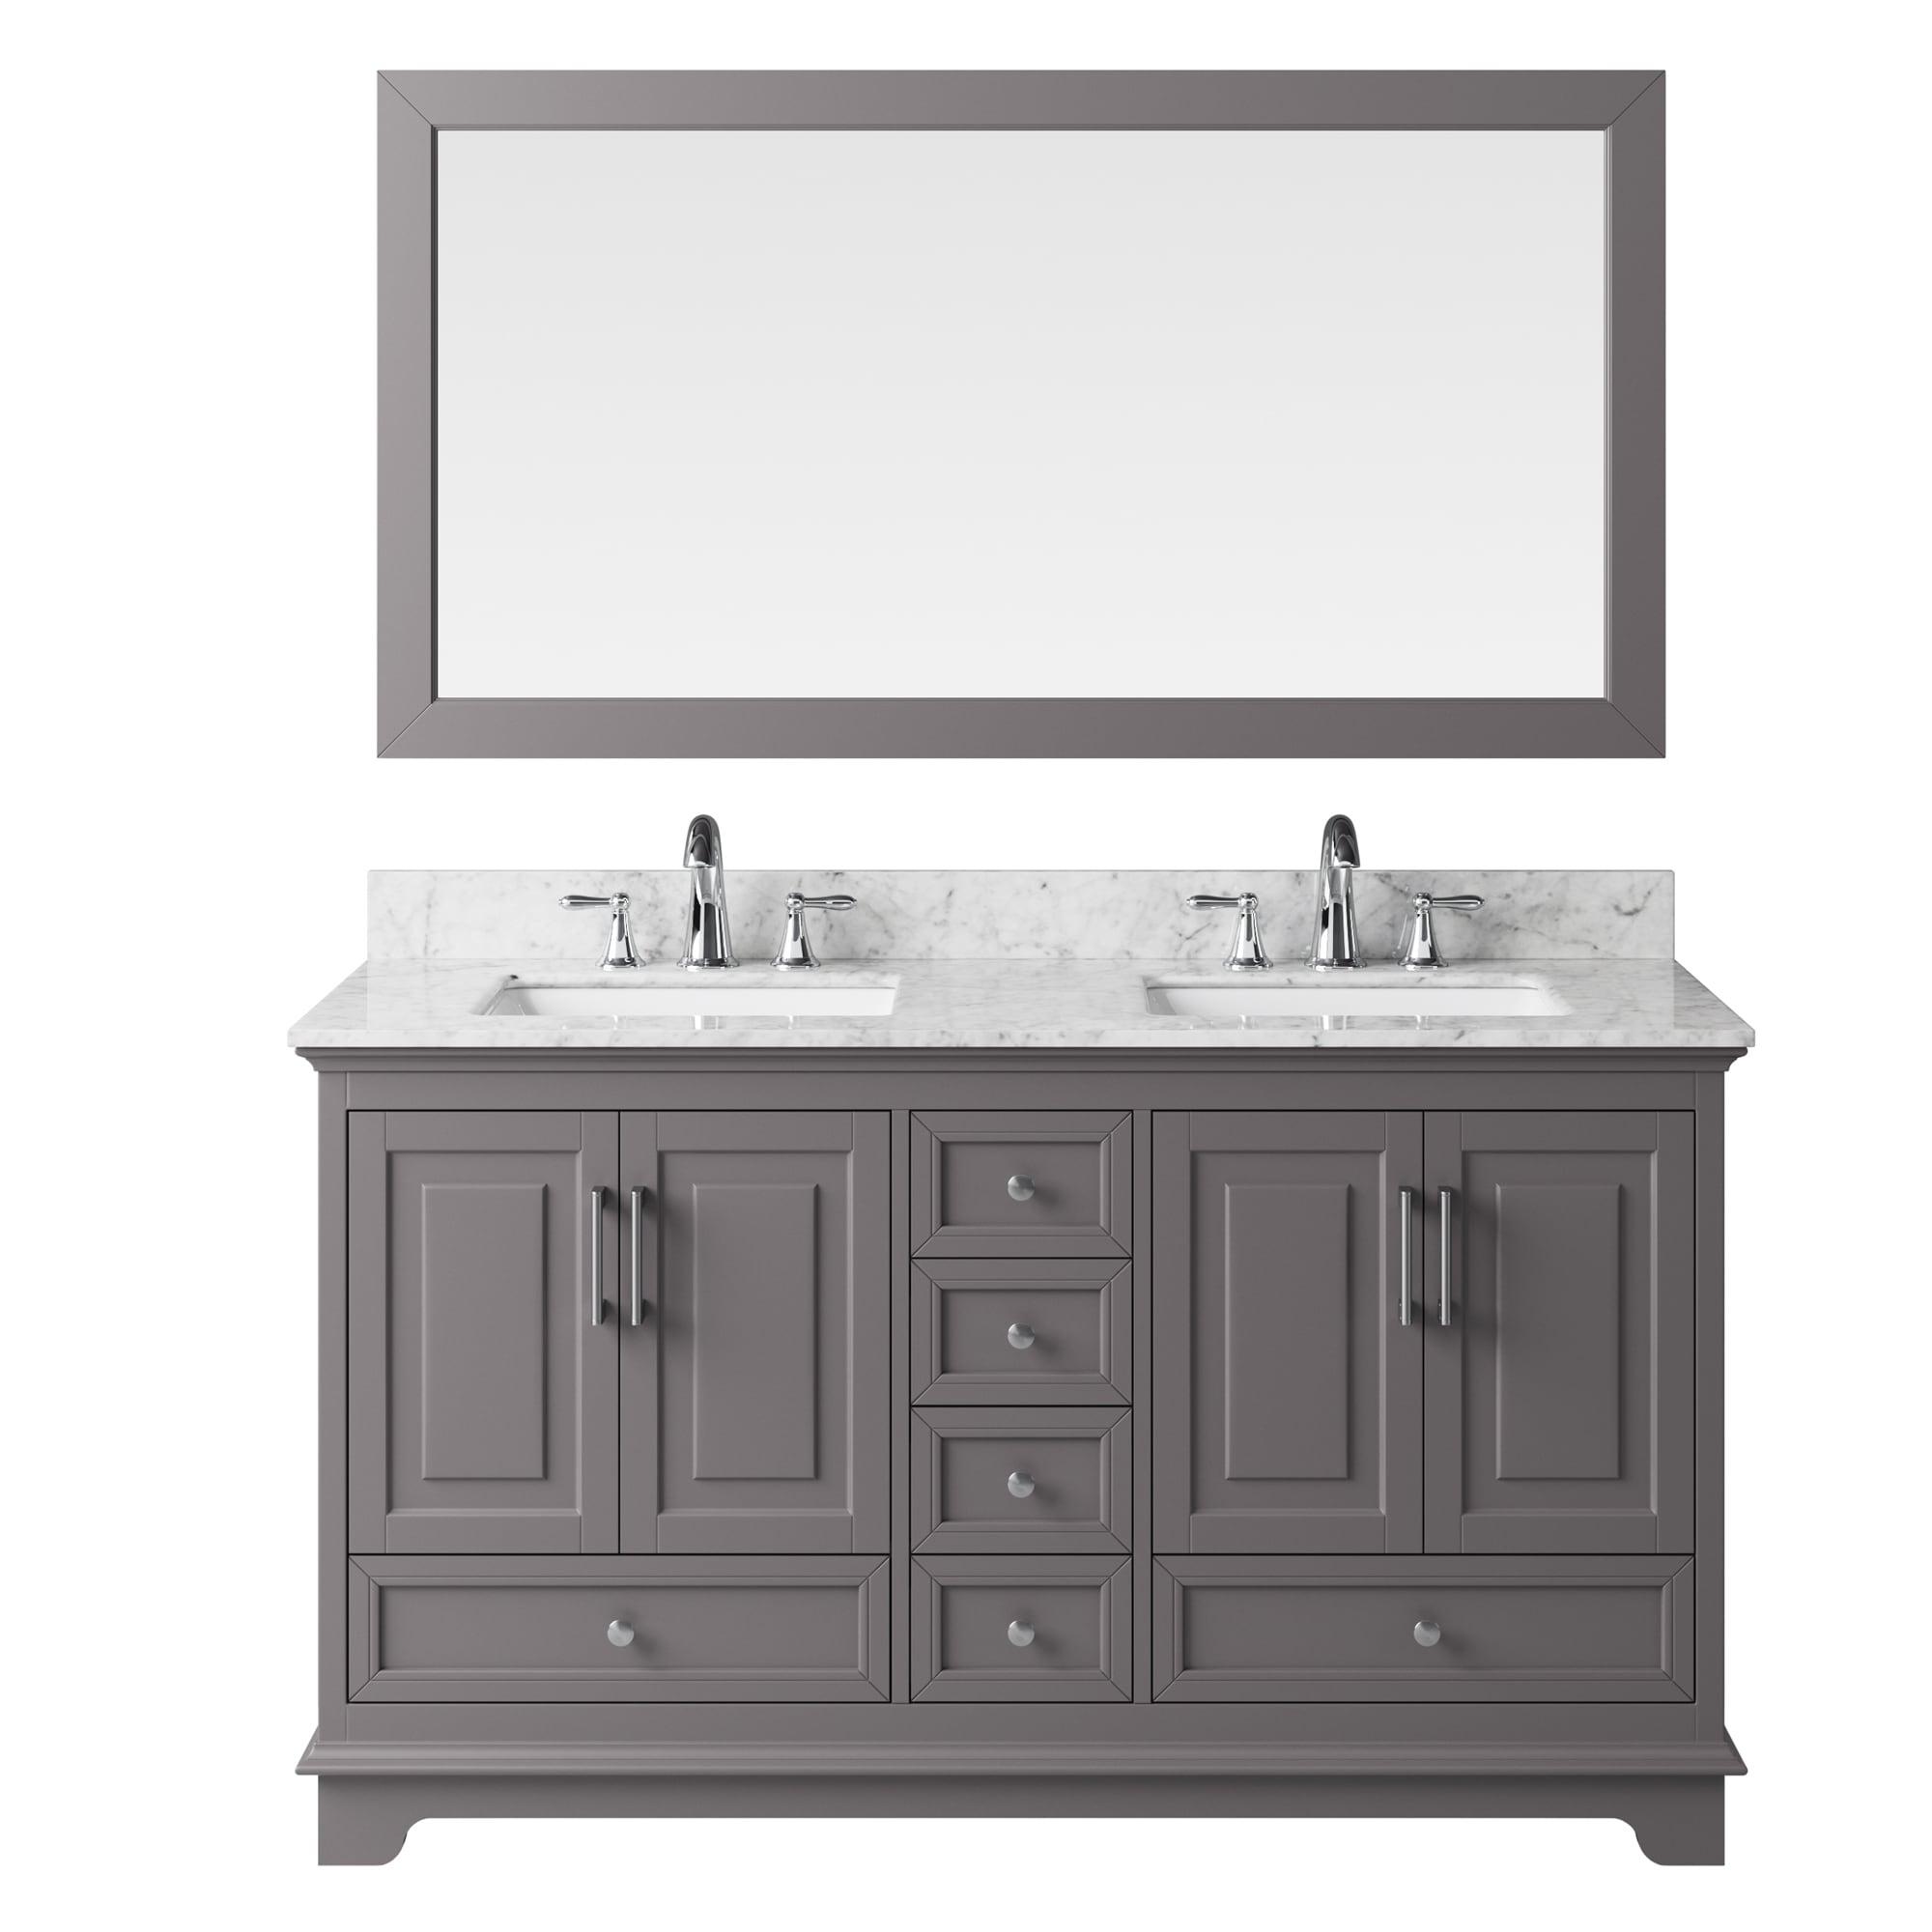 Shop Exclusive Heritage Taupe Grey Wood 60-inch Double-sink Bathroom ...